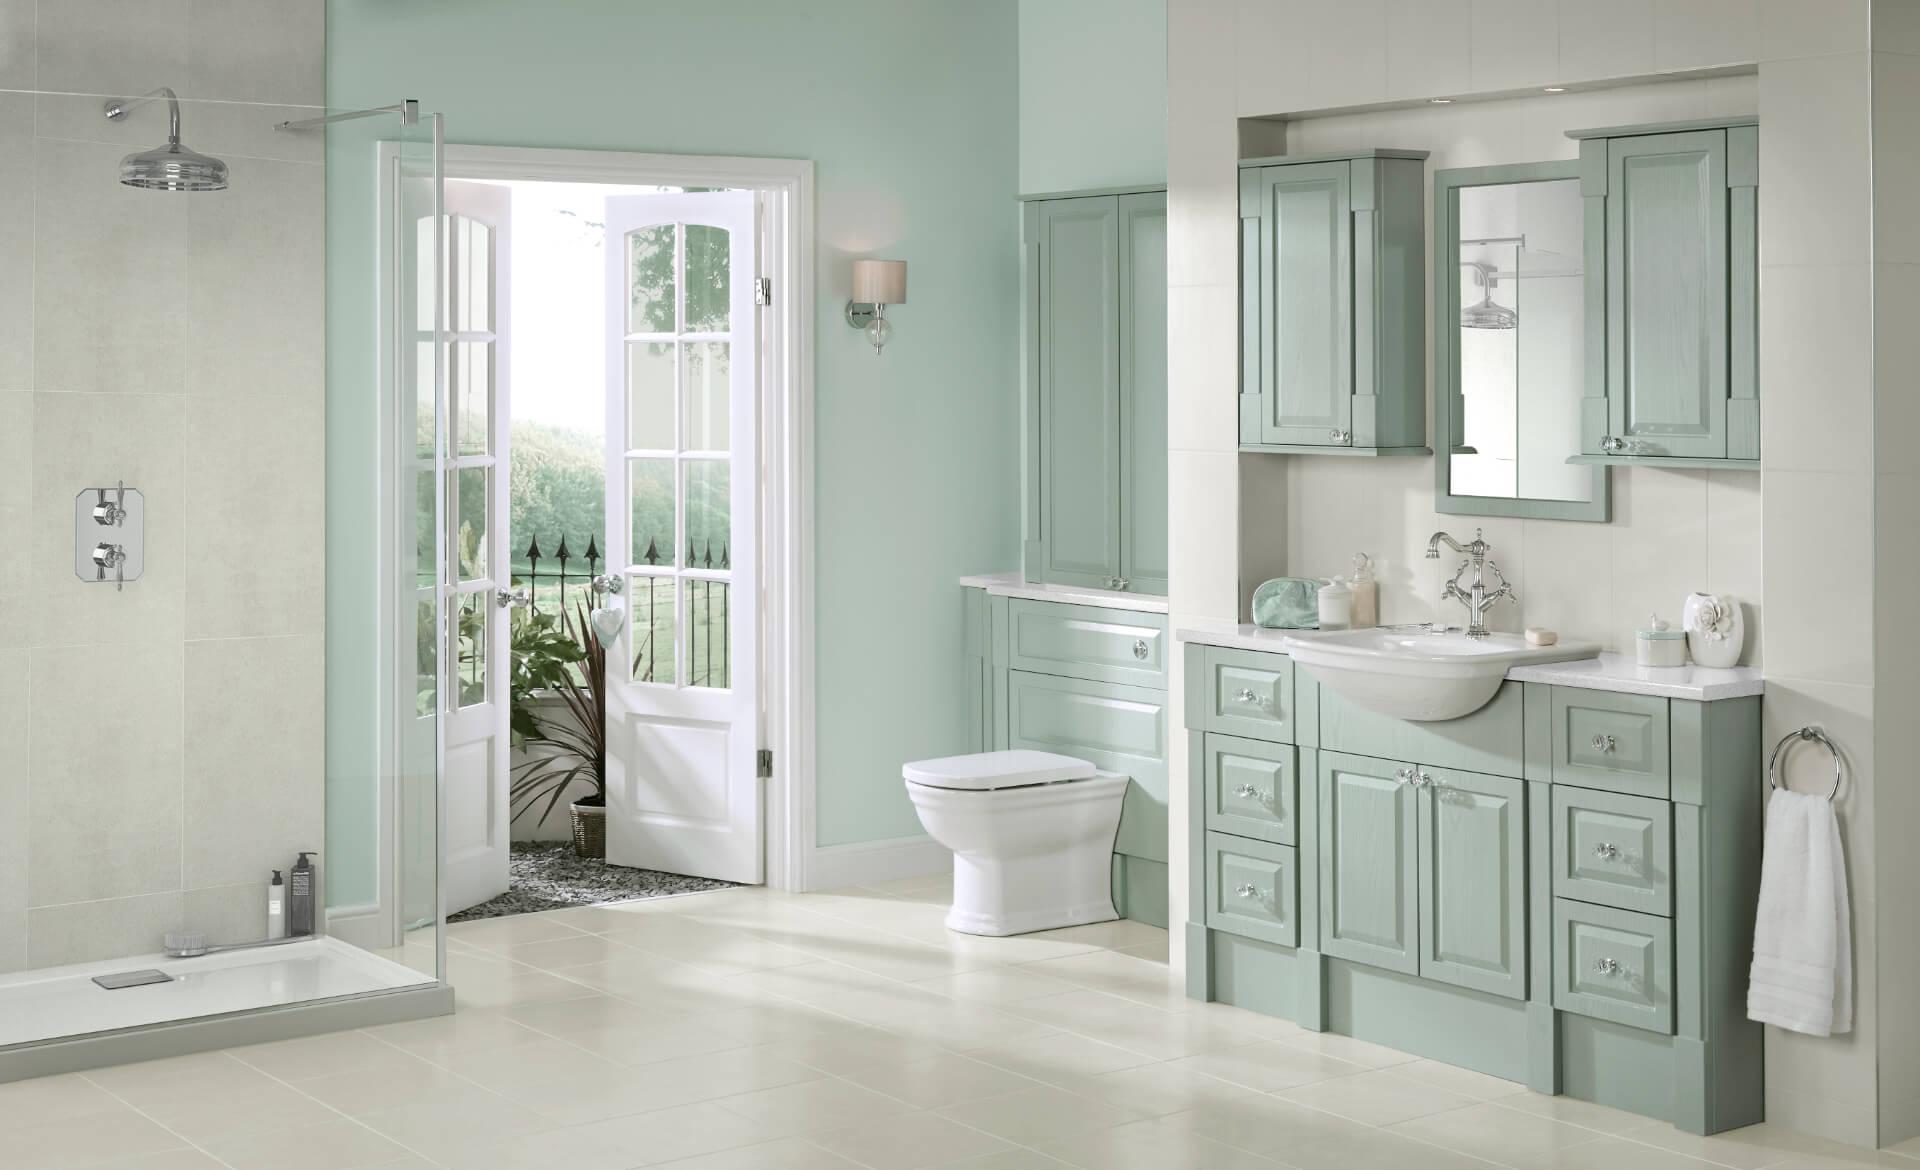 Nolte Original Fitted Mint Bathroom